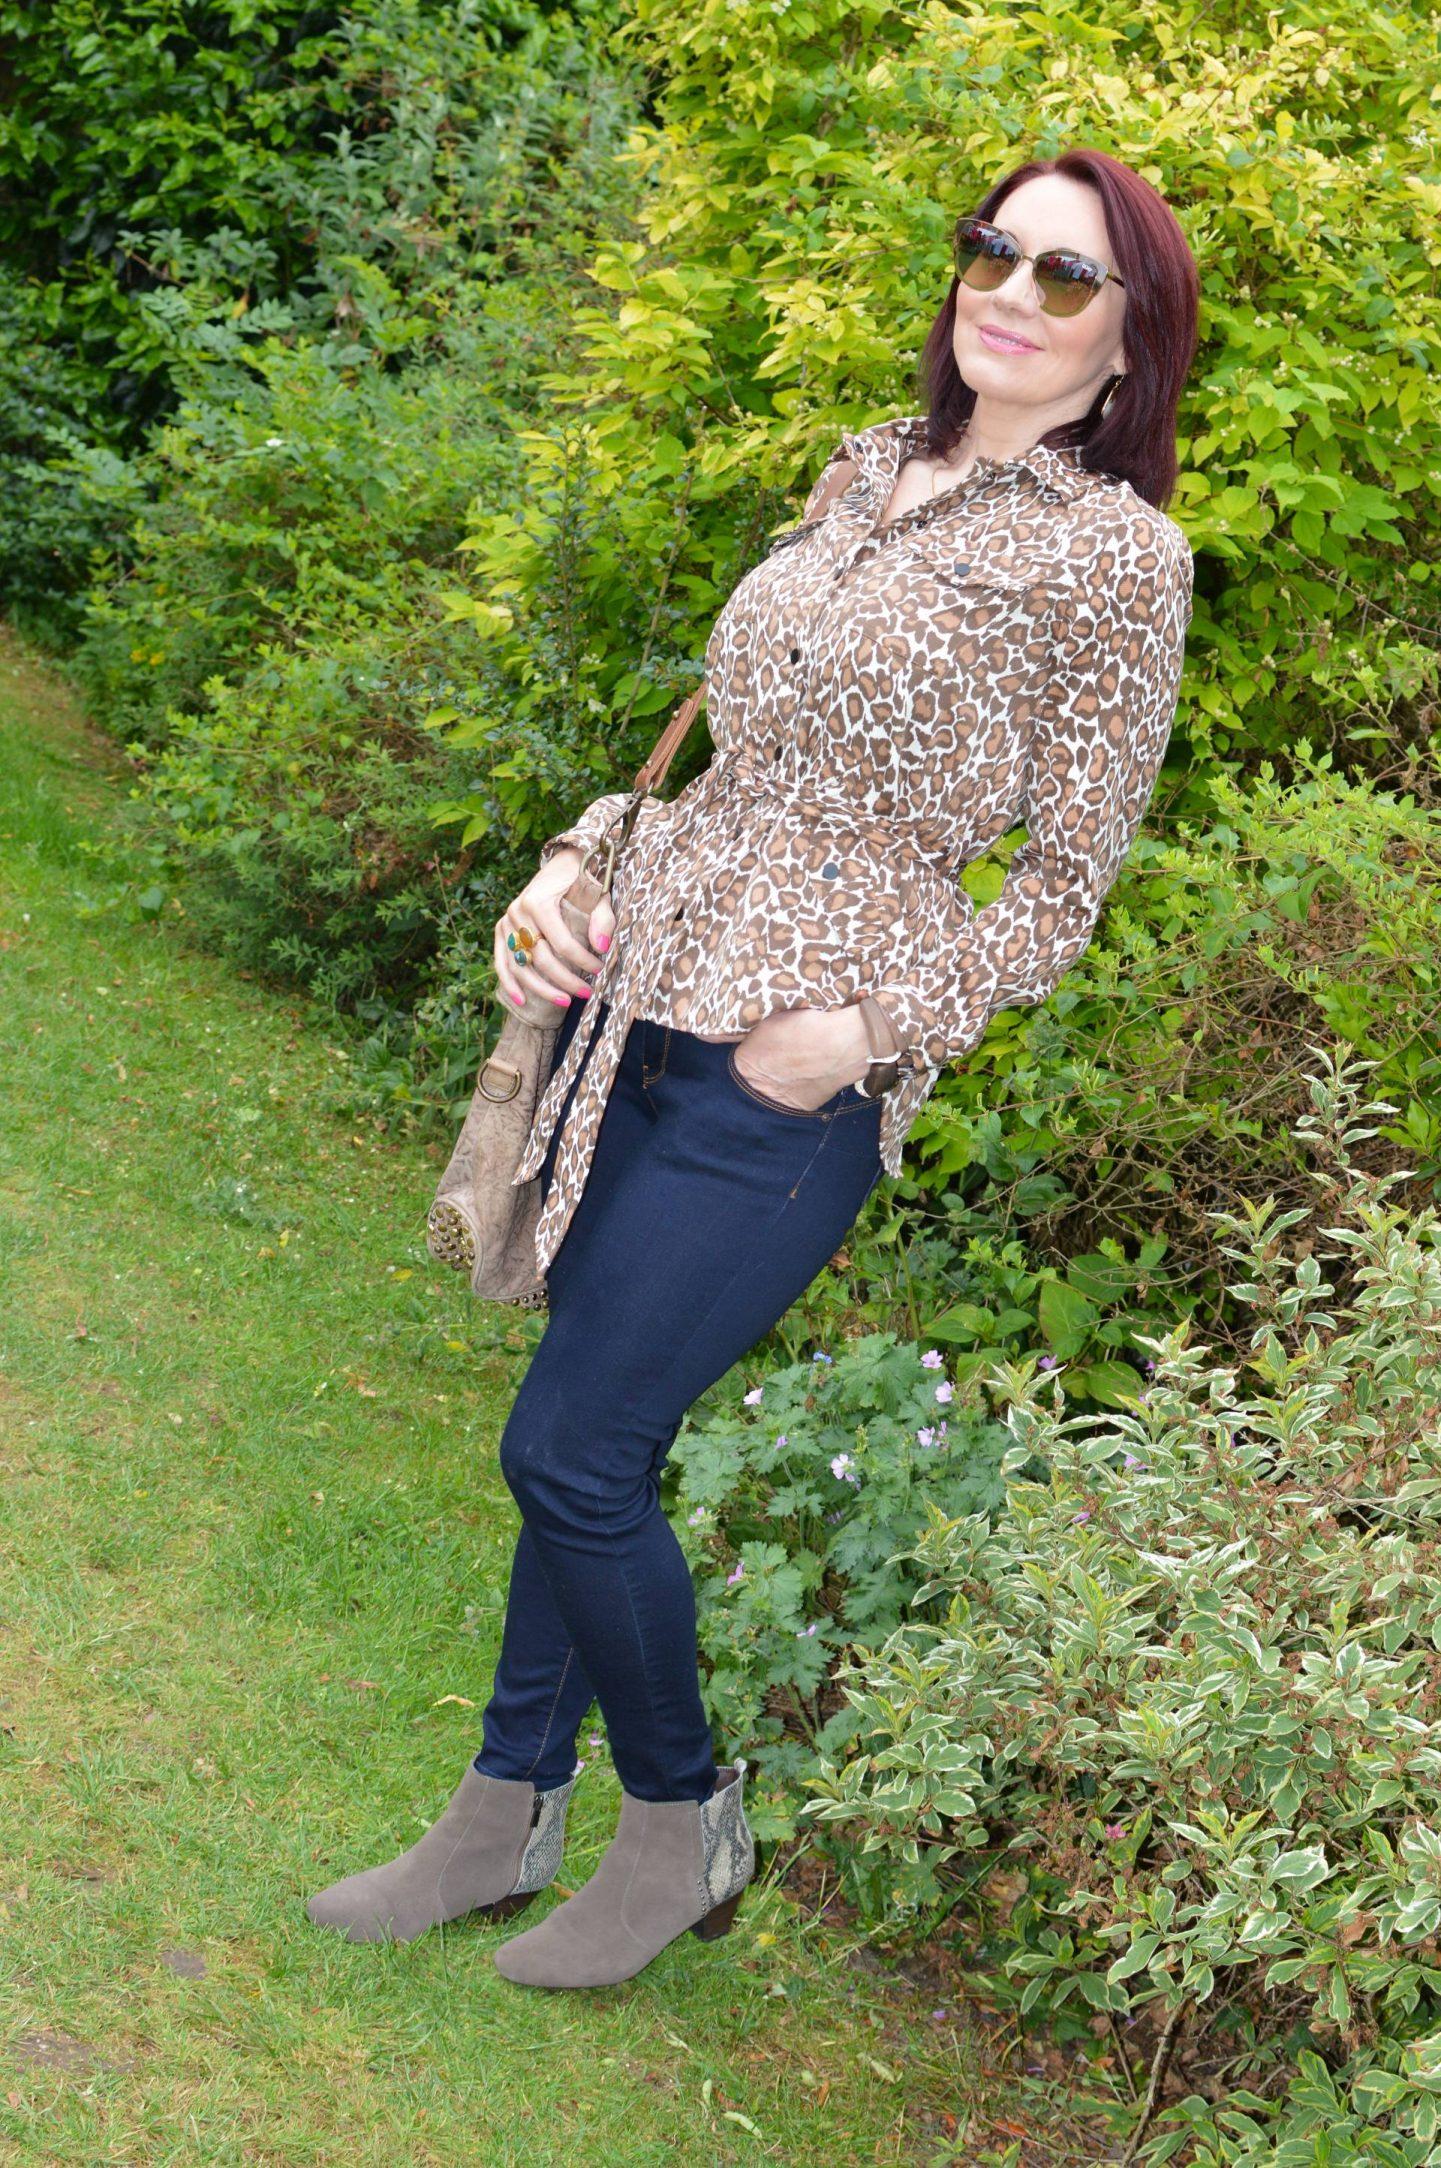 Scotch & Soda Safari Shirt and Jeans, Sara Berman brown studded bag, Quay gold sunglasses